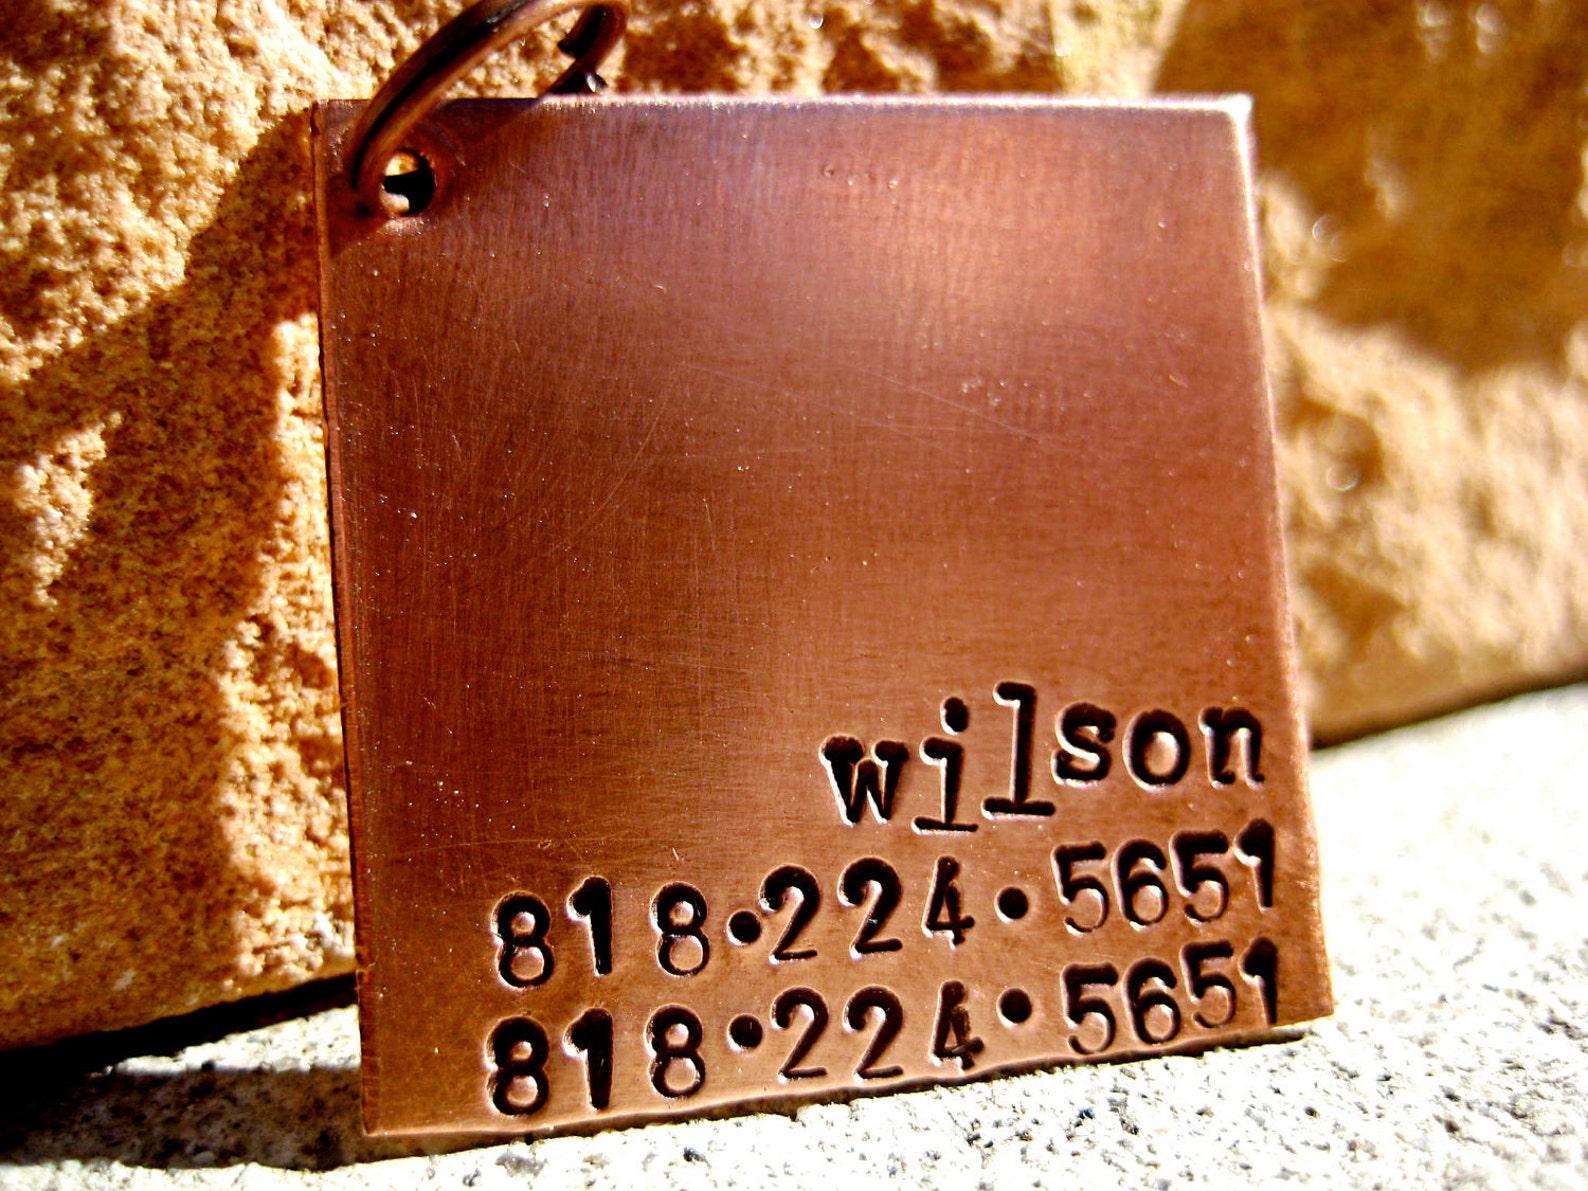 Handstamped pet tag in copper